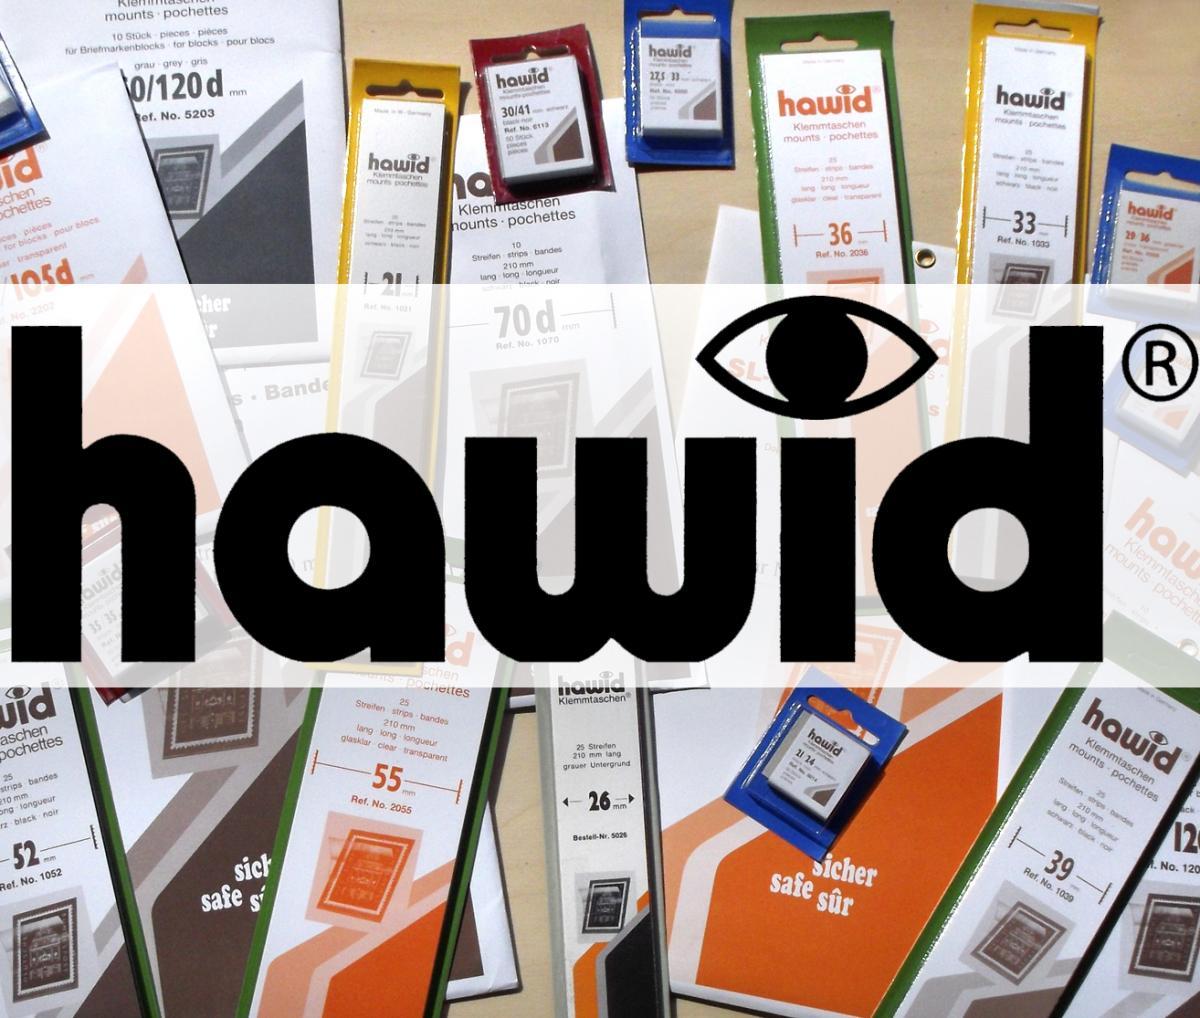 HAWID-Sonderblocks 2316, 96x206 mm, glasklar, 5 Stück 0